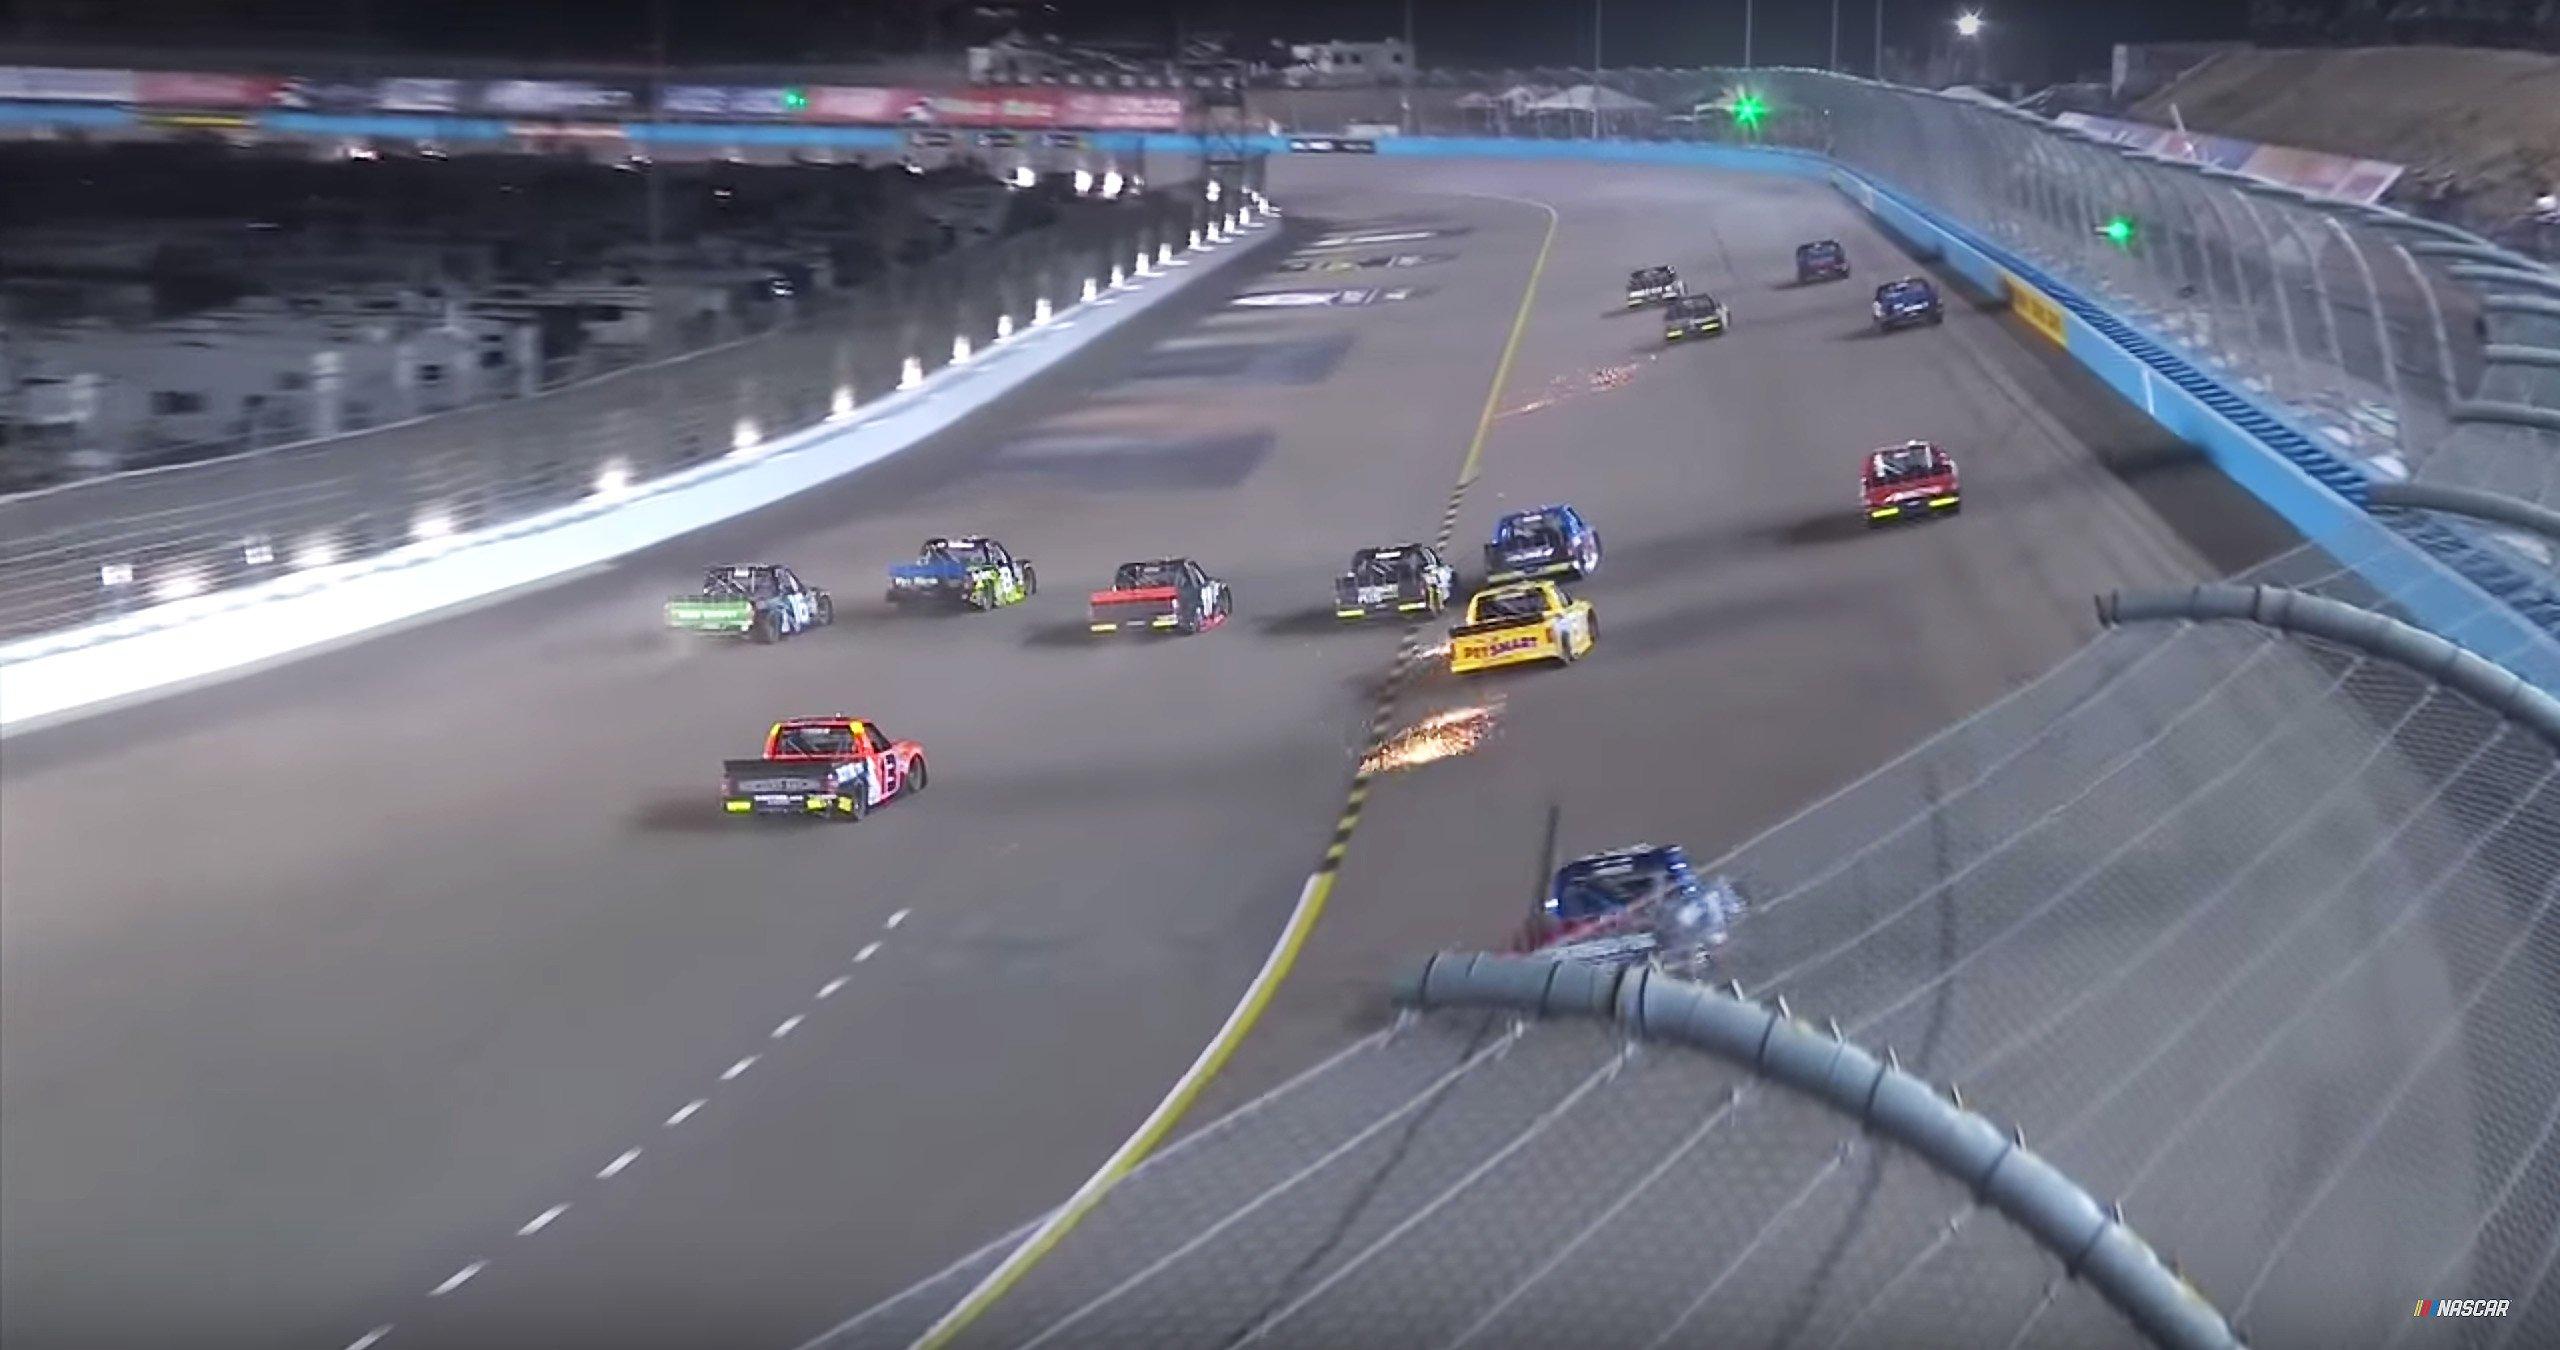 5 wide at Phoenix International Raceway